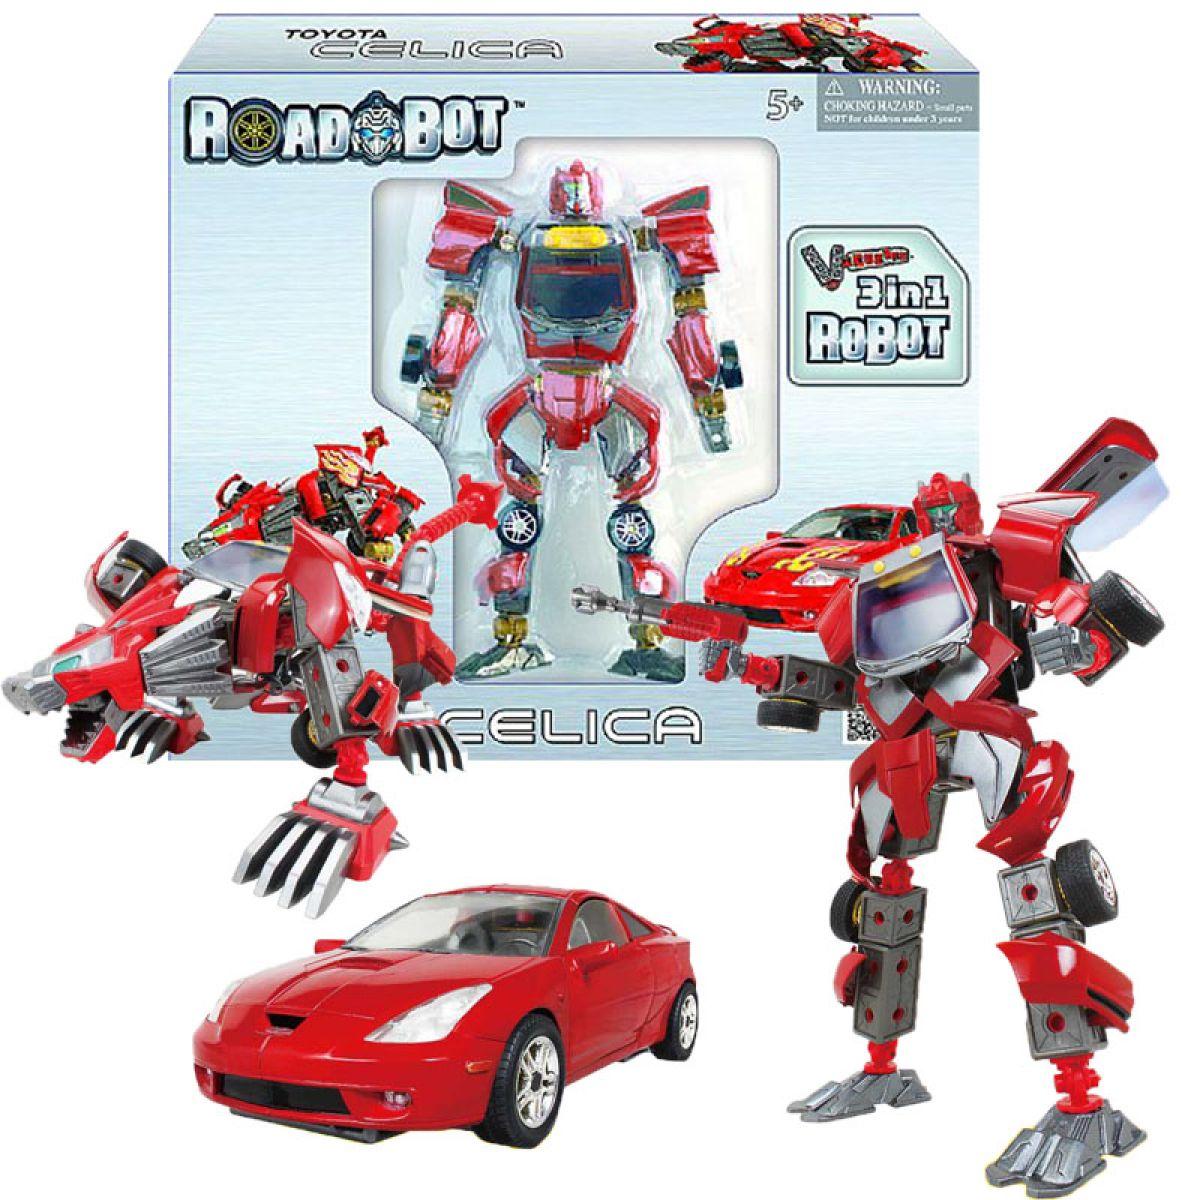 Road Bot ROBOT 3v 1 - TOYOTA CELICA